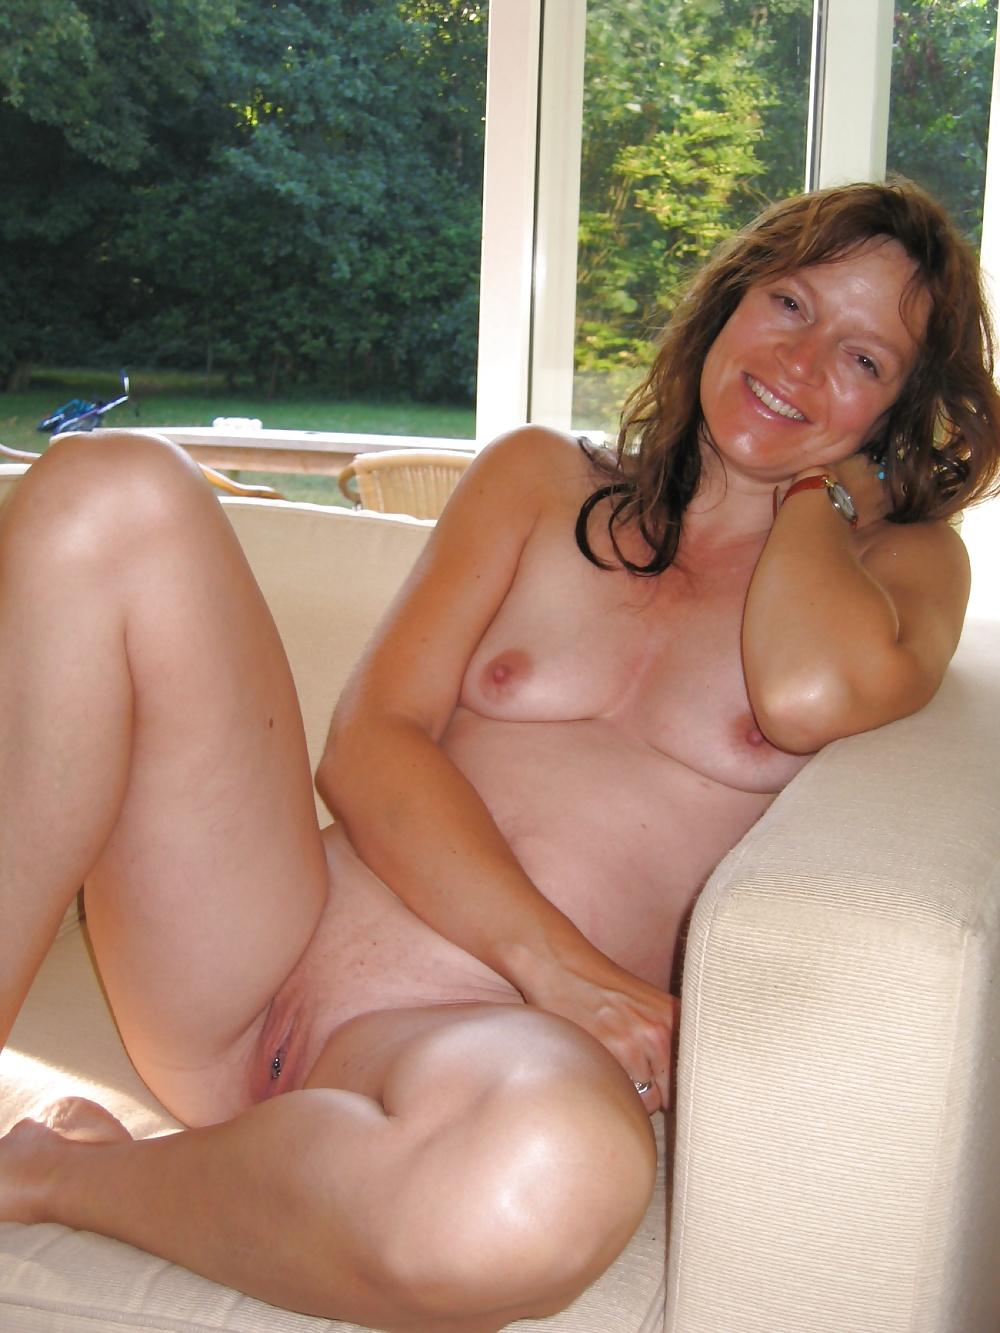 Porn pov by window sex brunette